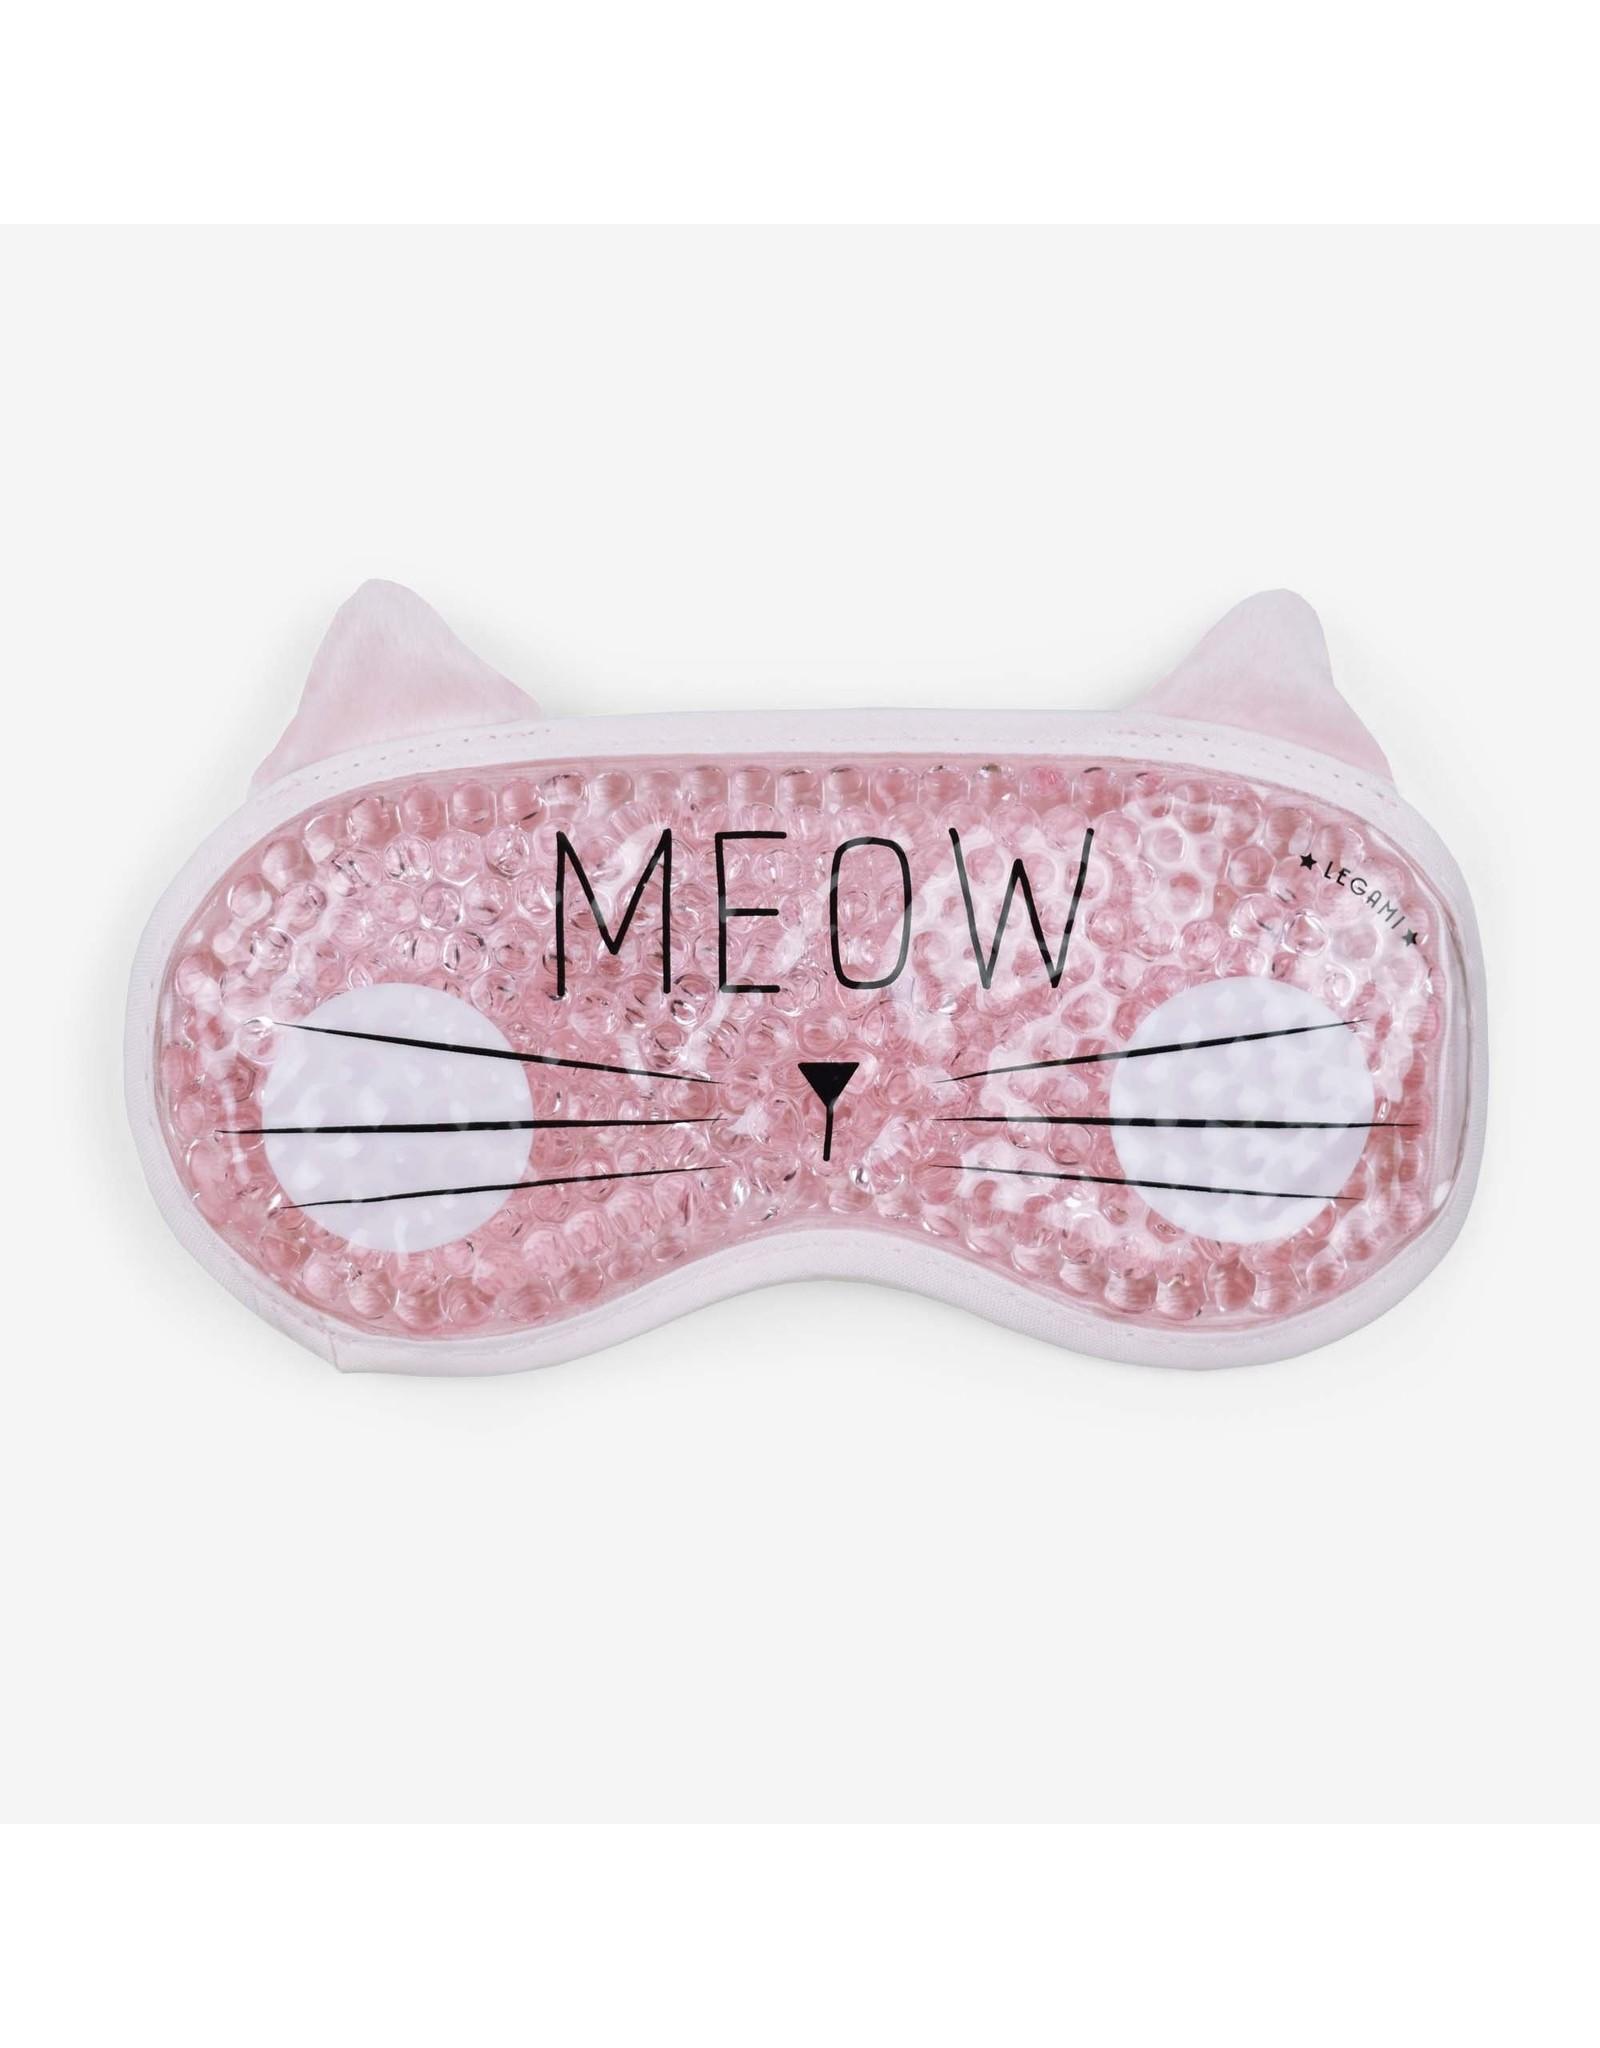 Legami eye mask shaped like a cat